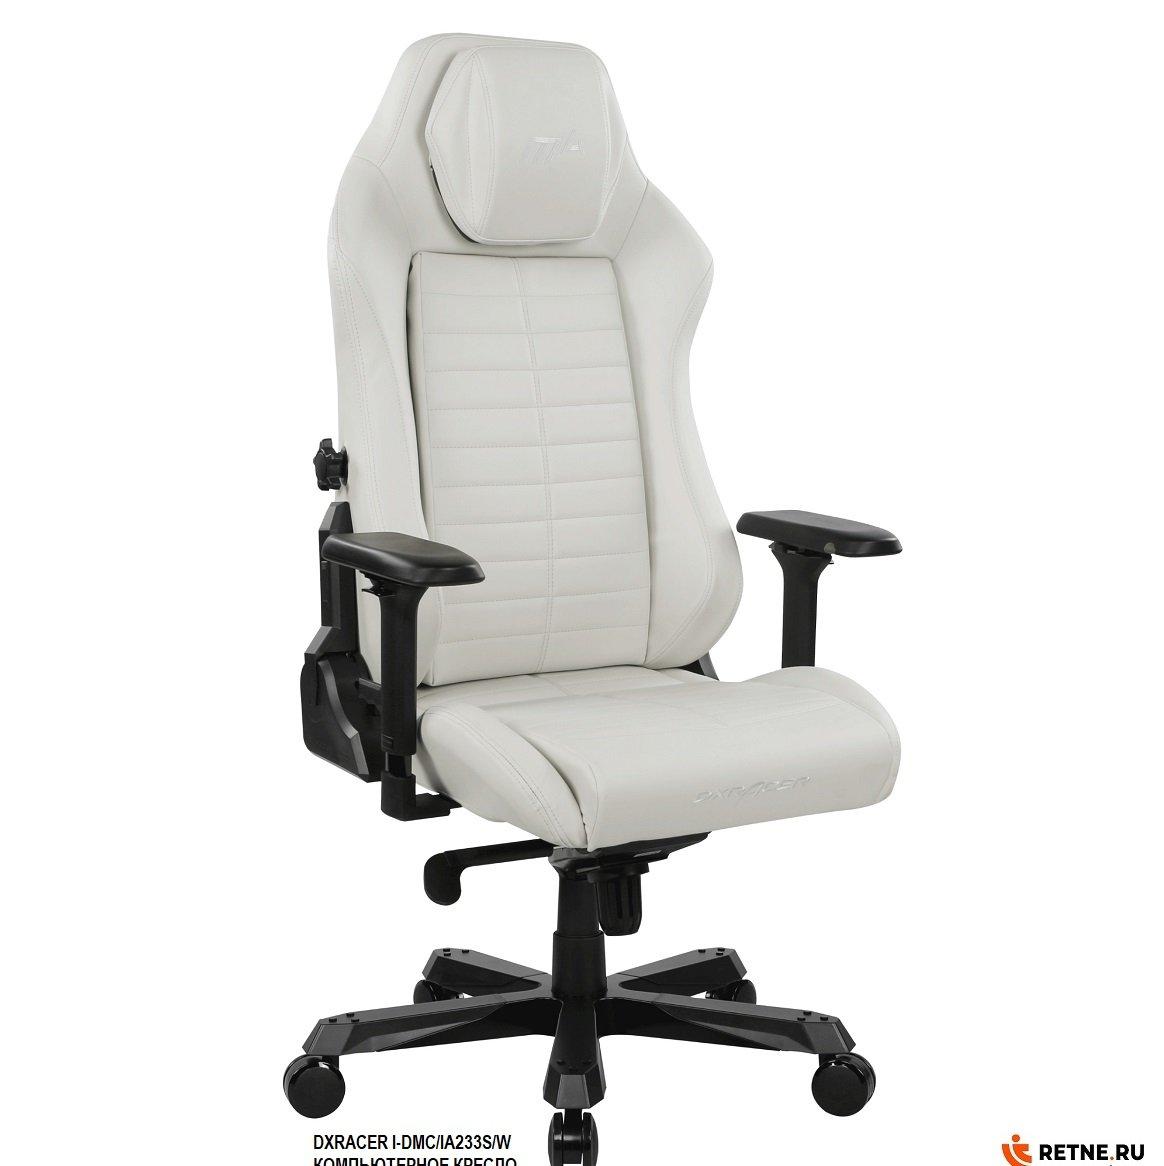 DXRacer-MASTER-Gaming-Chair